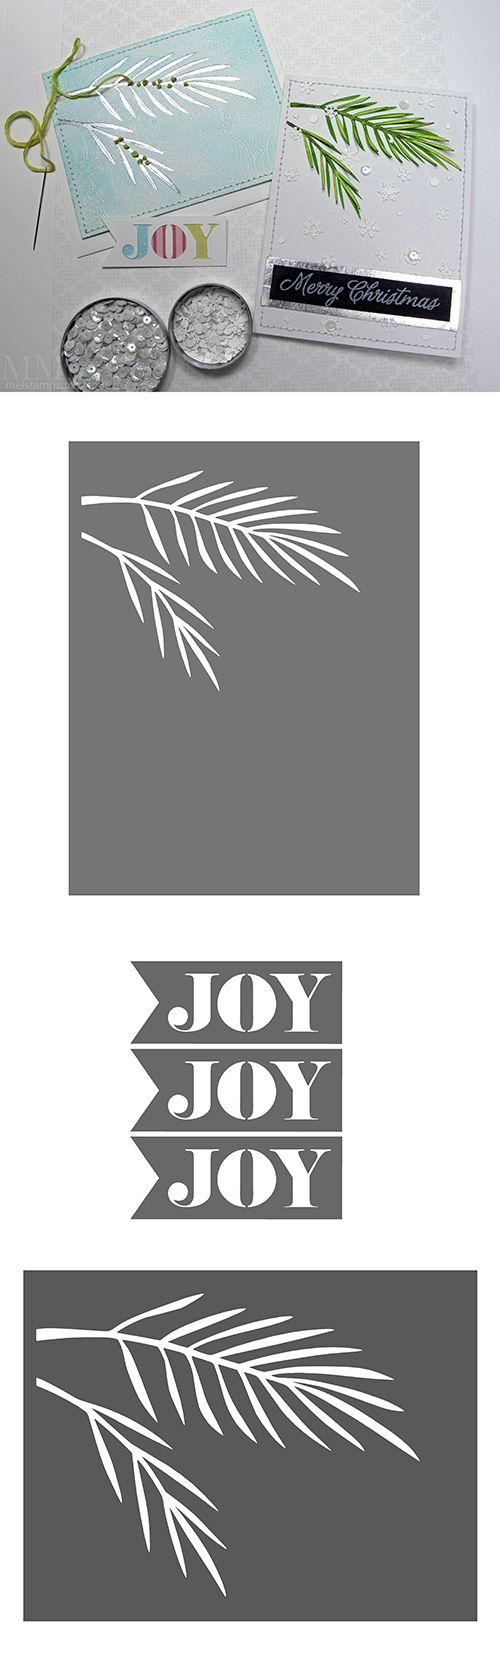 Christmas tree bough & 'JOY' flag - free Silhouette & SVG cutting files #CutFile